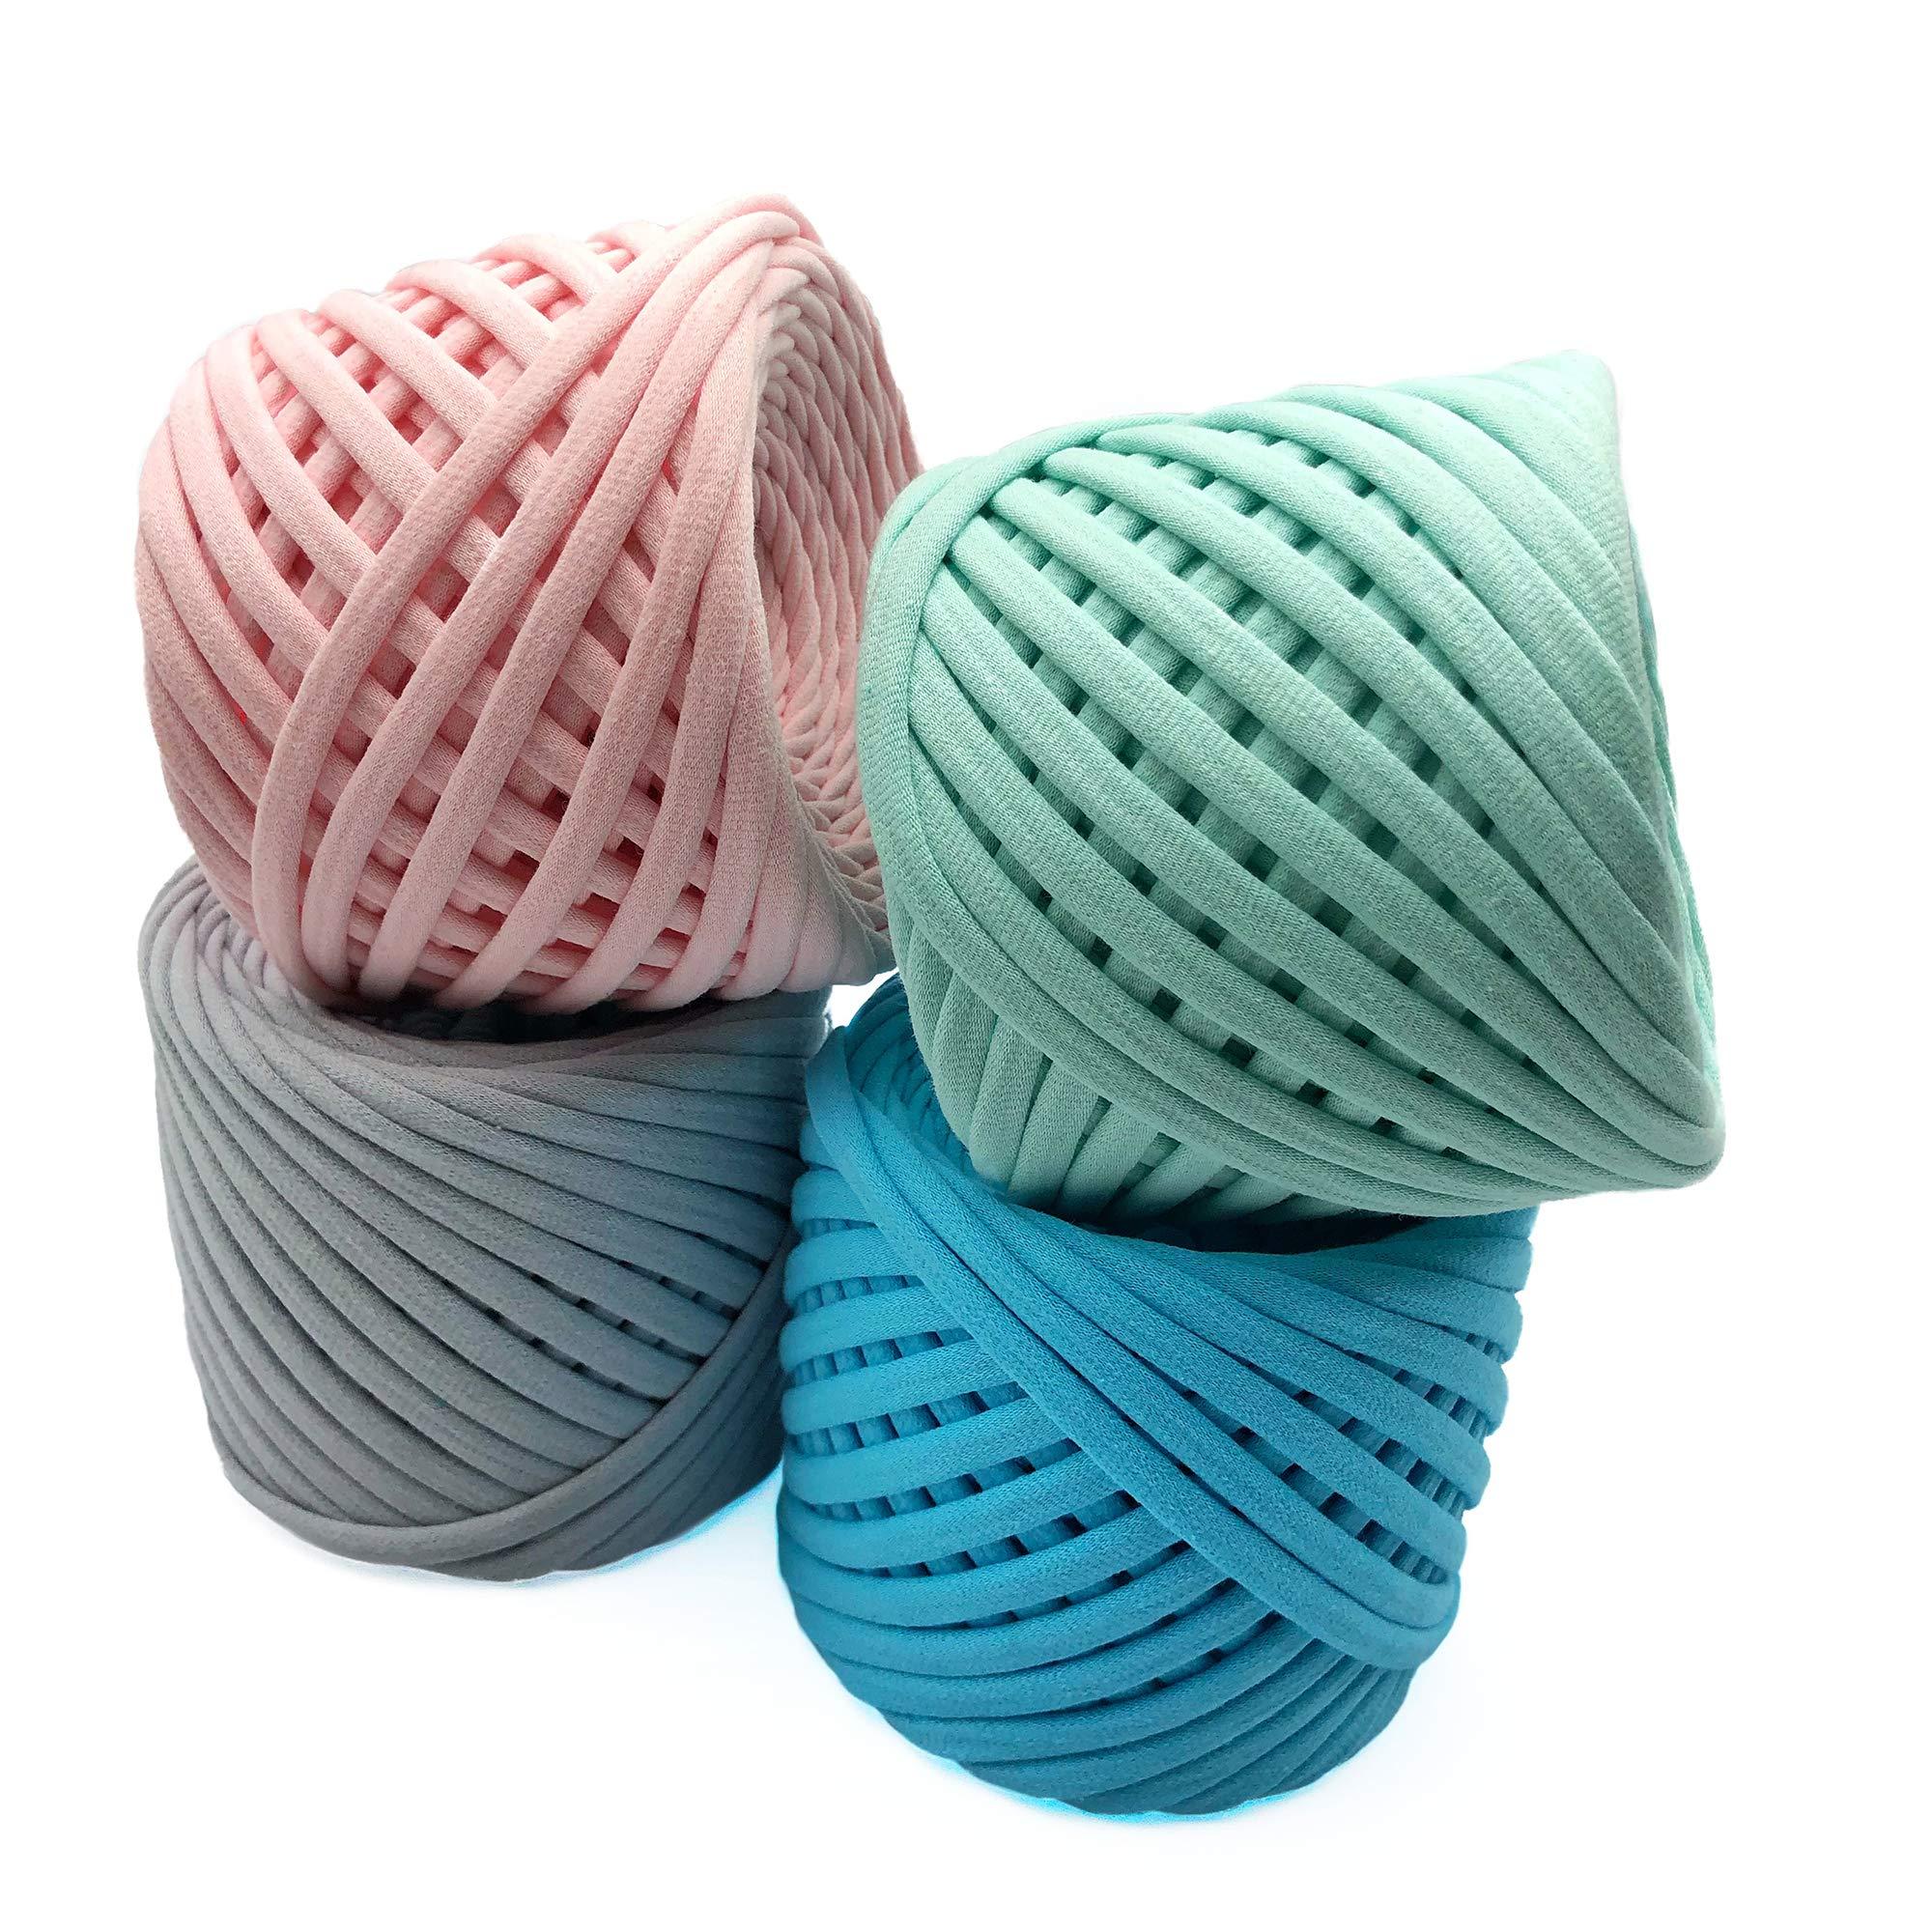 T-Shirt Yarn Fettuccini Zpagetti Set - 4 Balls Total of 218 Yards - Tshirt Yarn Kit for Crocheting - Ribbon Yarn 100% Cotton - Knitting Yarn Ball - T Yarn Organic - Macrame T-Yarn Venice